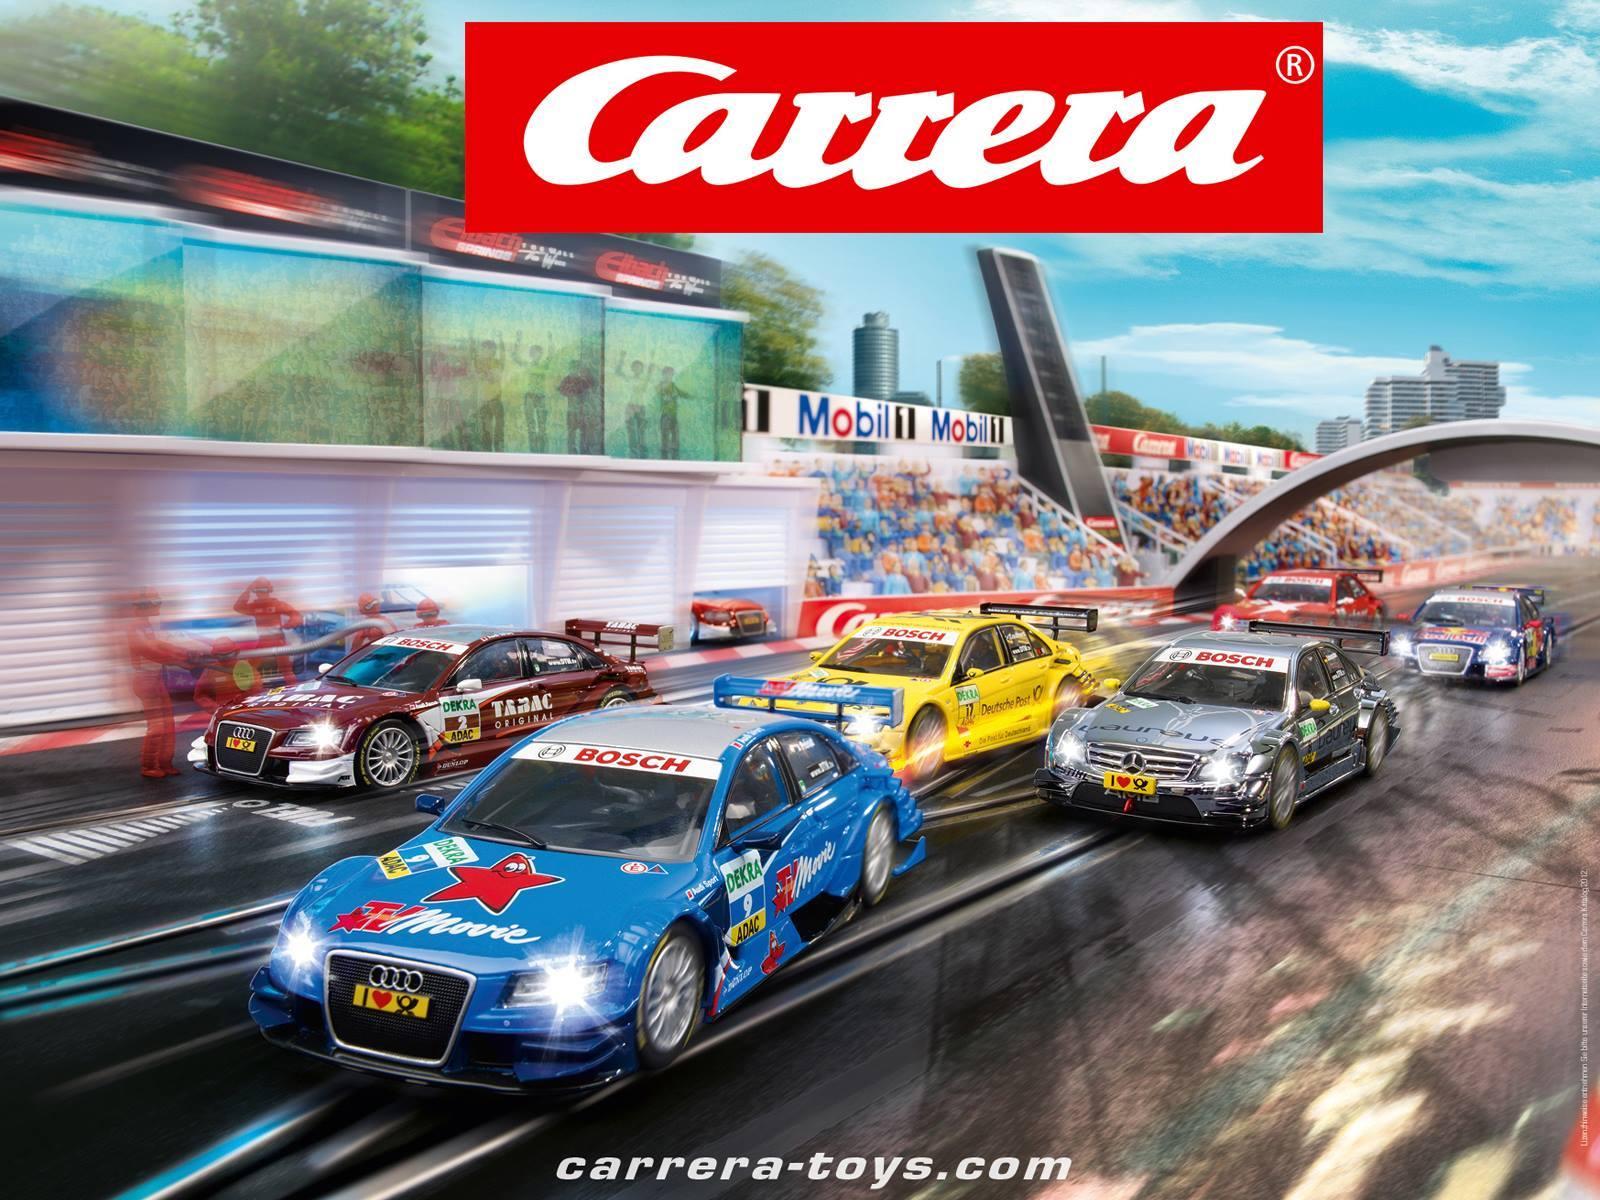 Carrera Event Freckenhorst